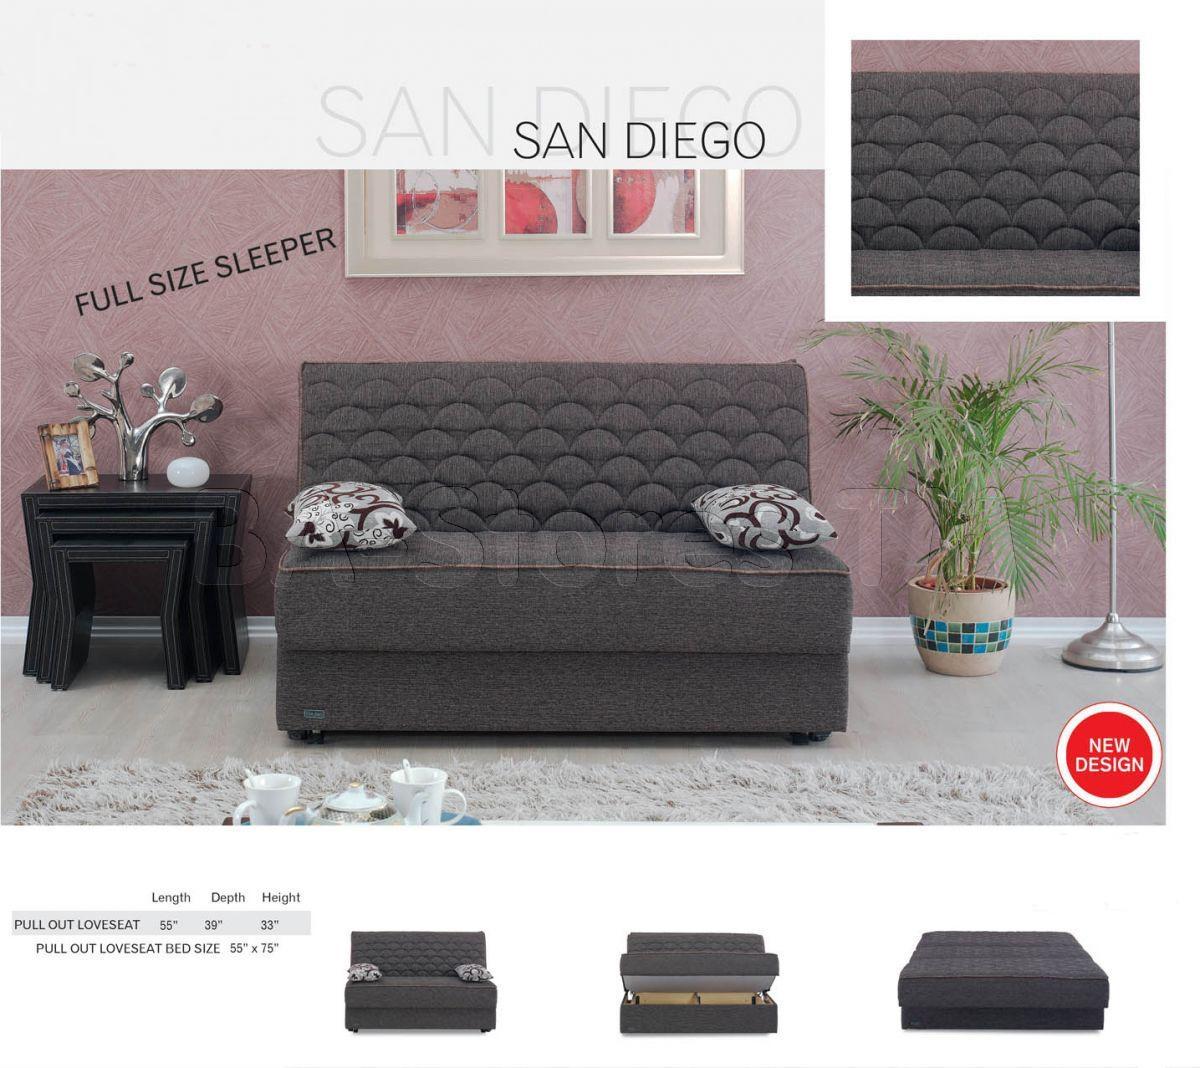 Meyan Furniture San Diego Armless Sleeper Sofa Bed | Sofa Beds San For San Diego Sleeper Sofas (View 19 of 20)